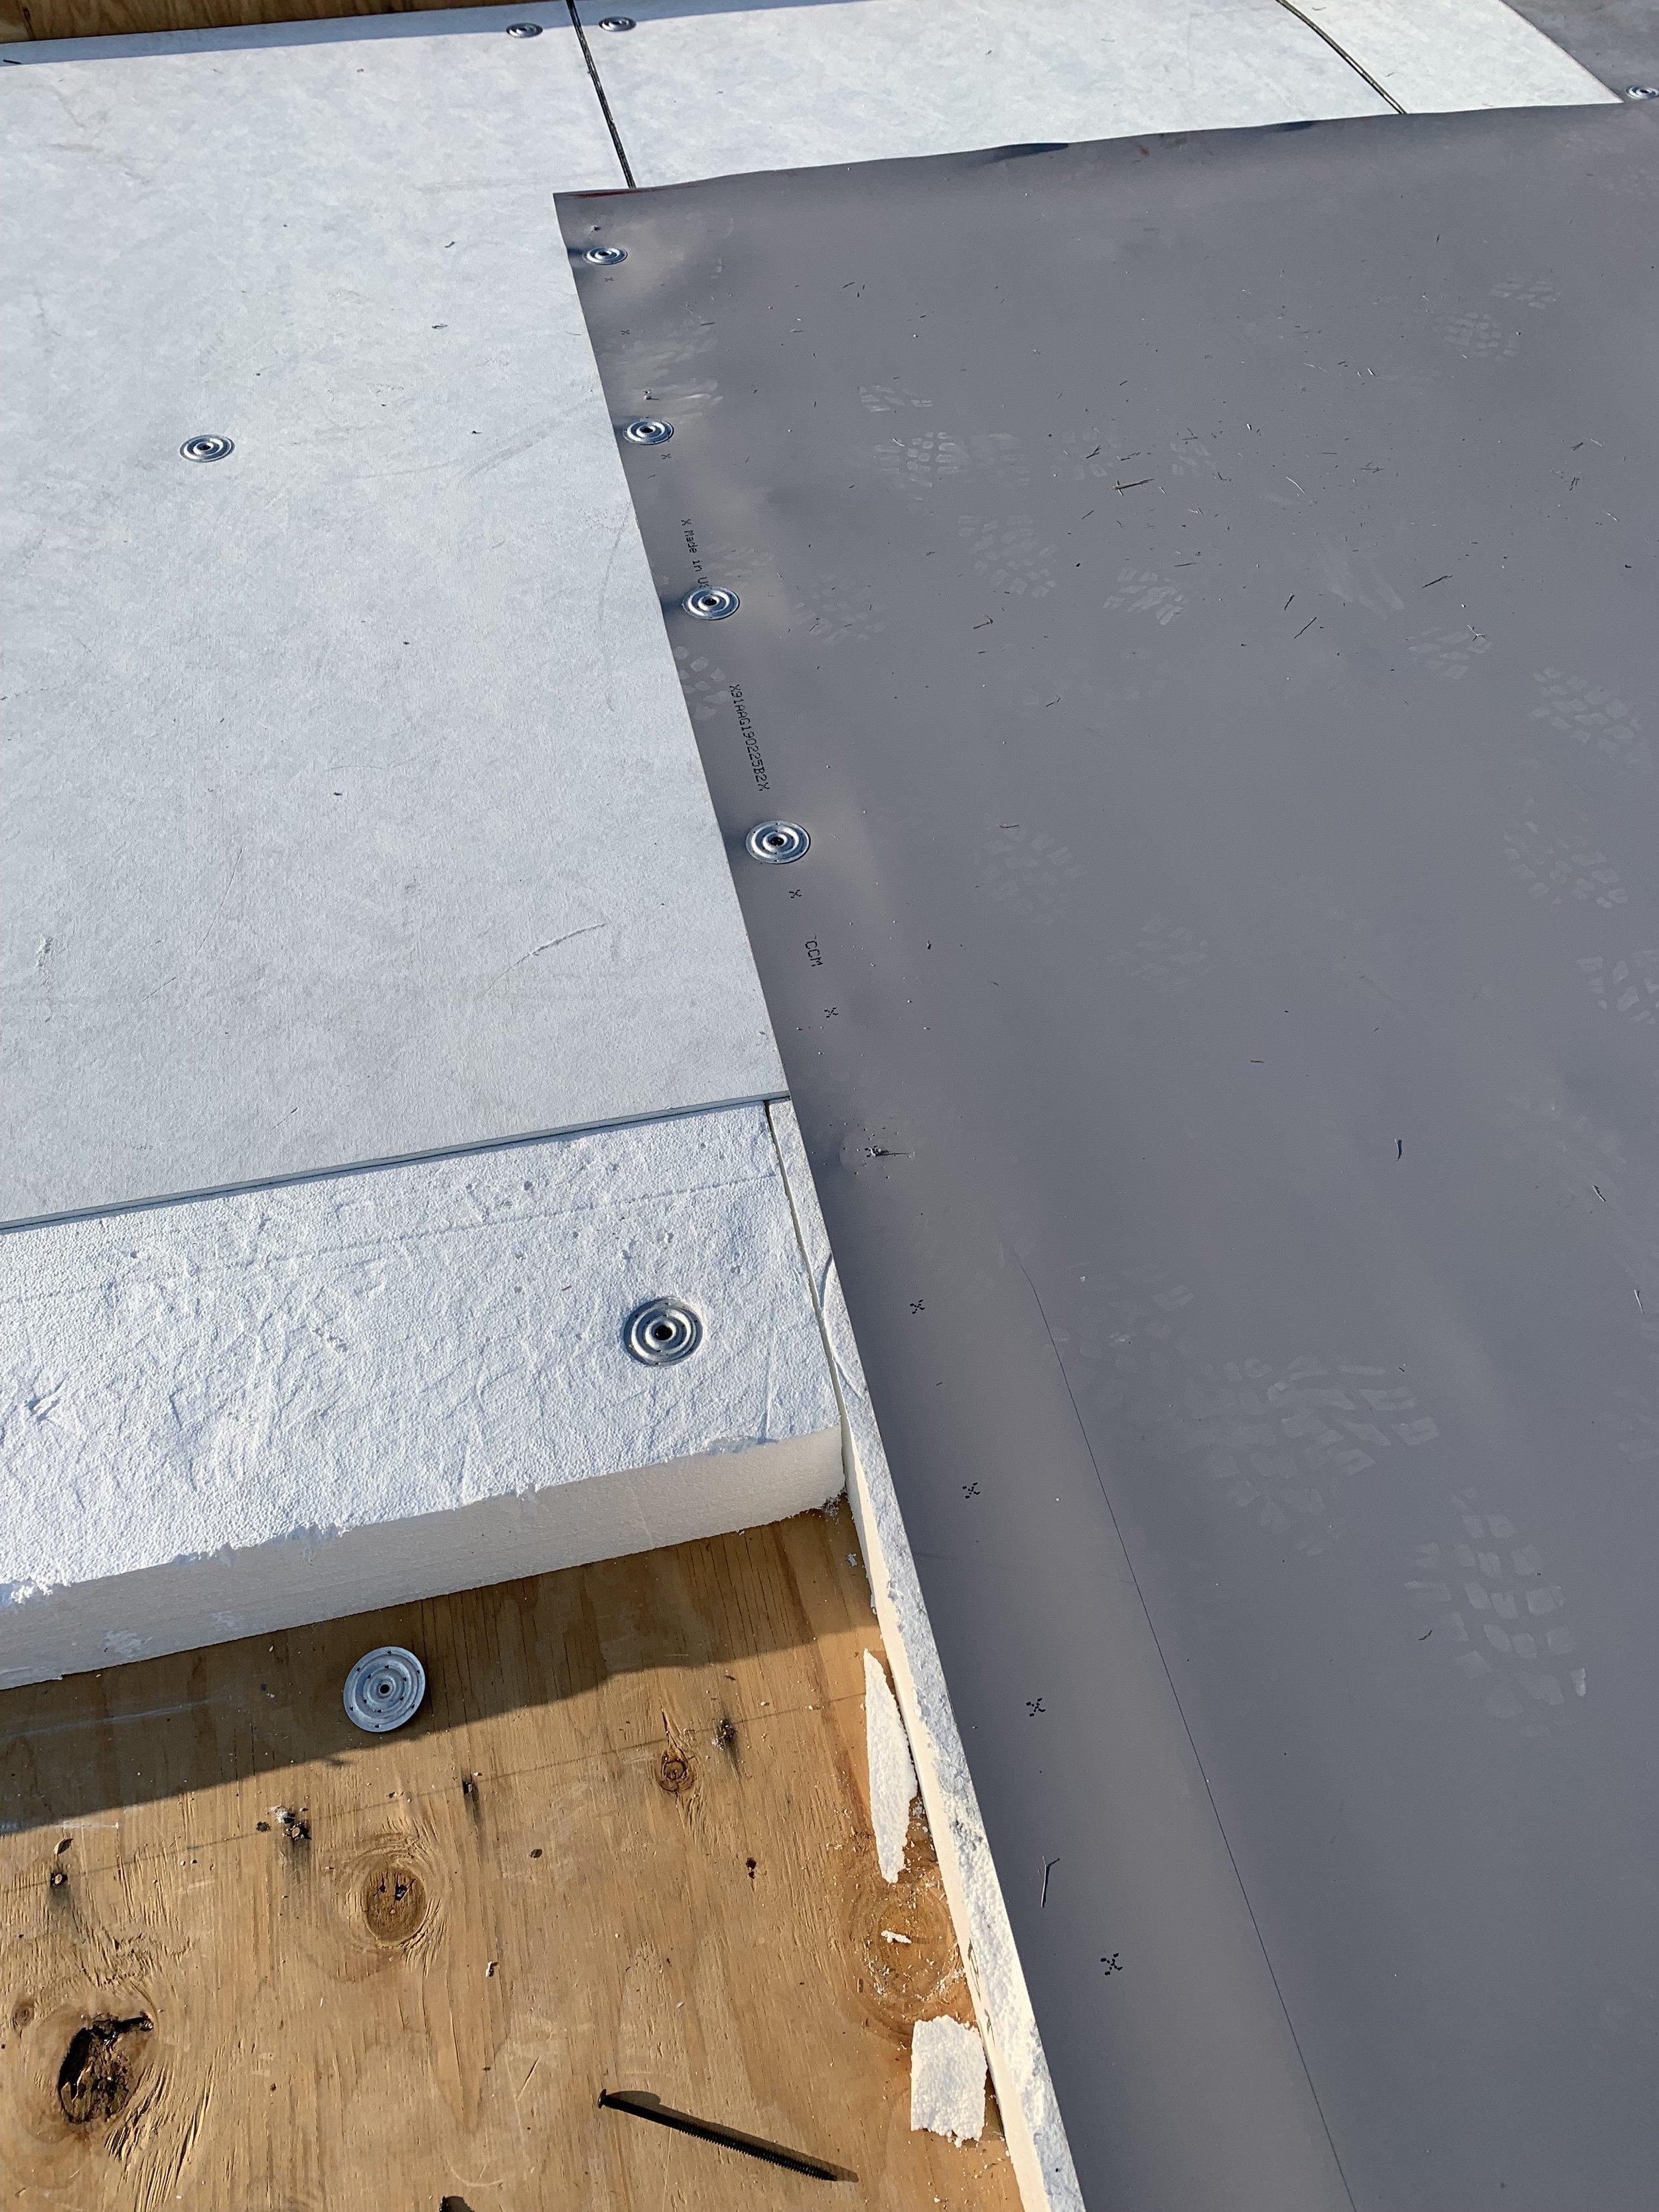 Tapered insulation